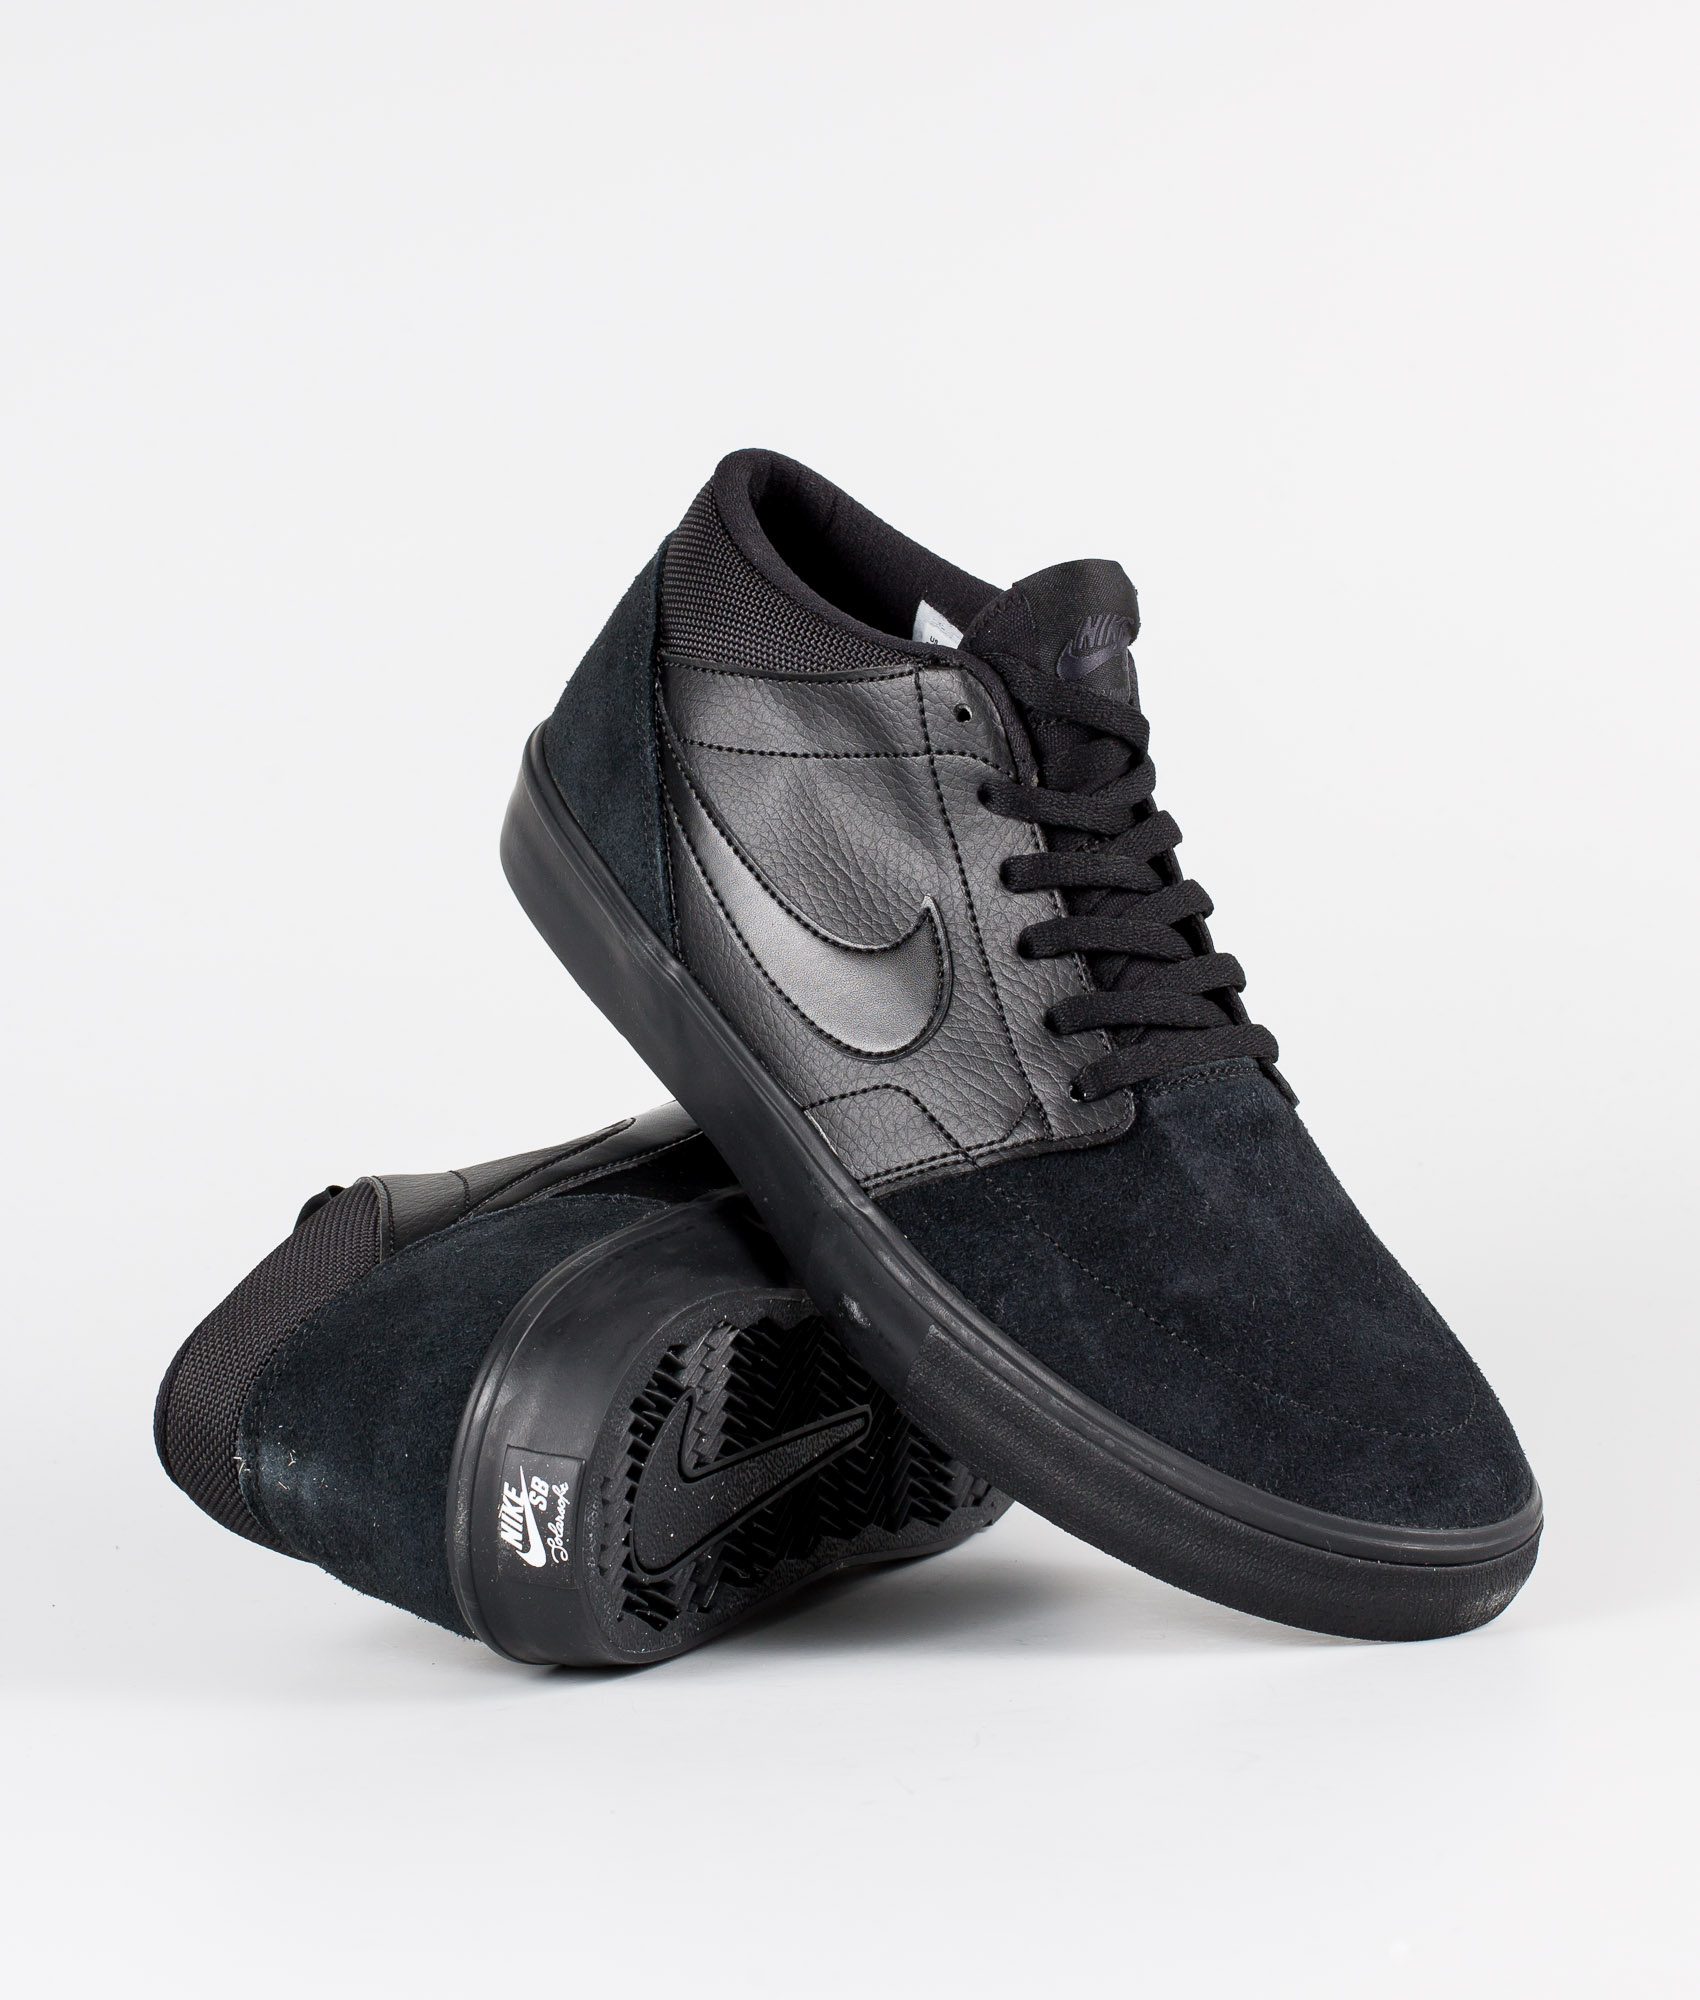 Nike sko Kjøp online her! | Ridestore.no